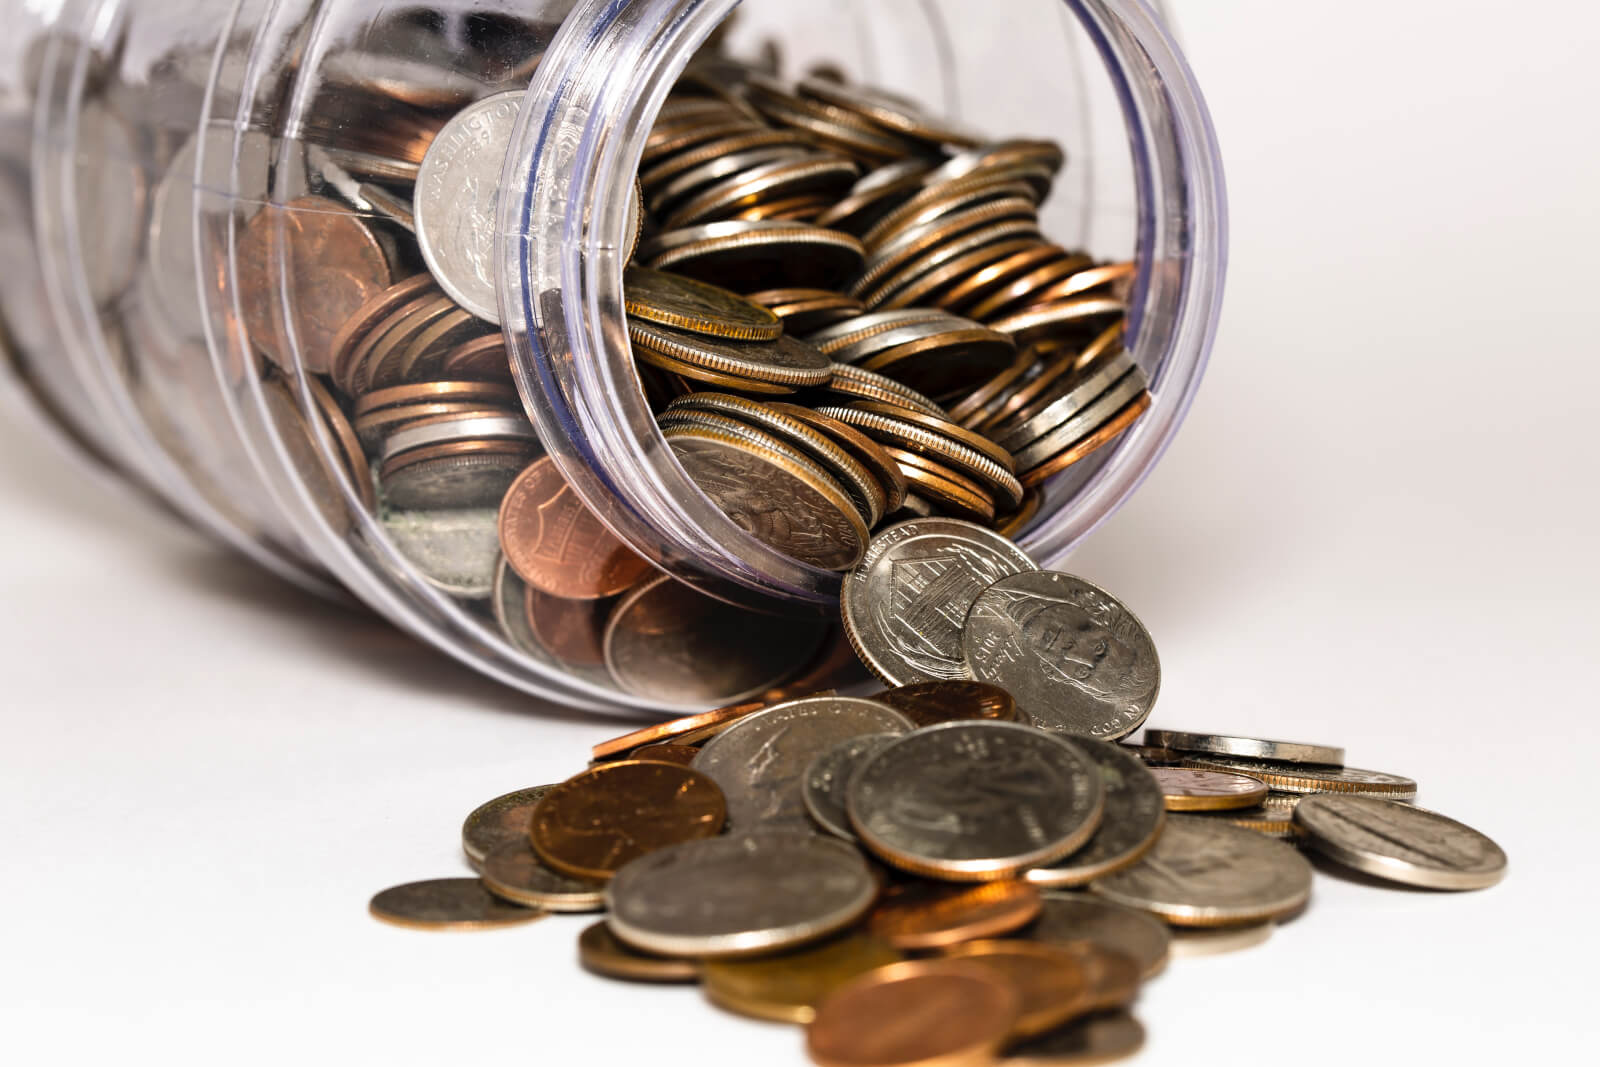 STAP-budget vervangt fiscale scholingsaftrek